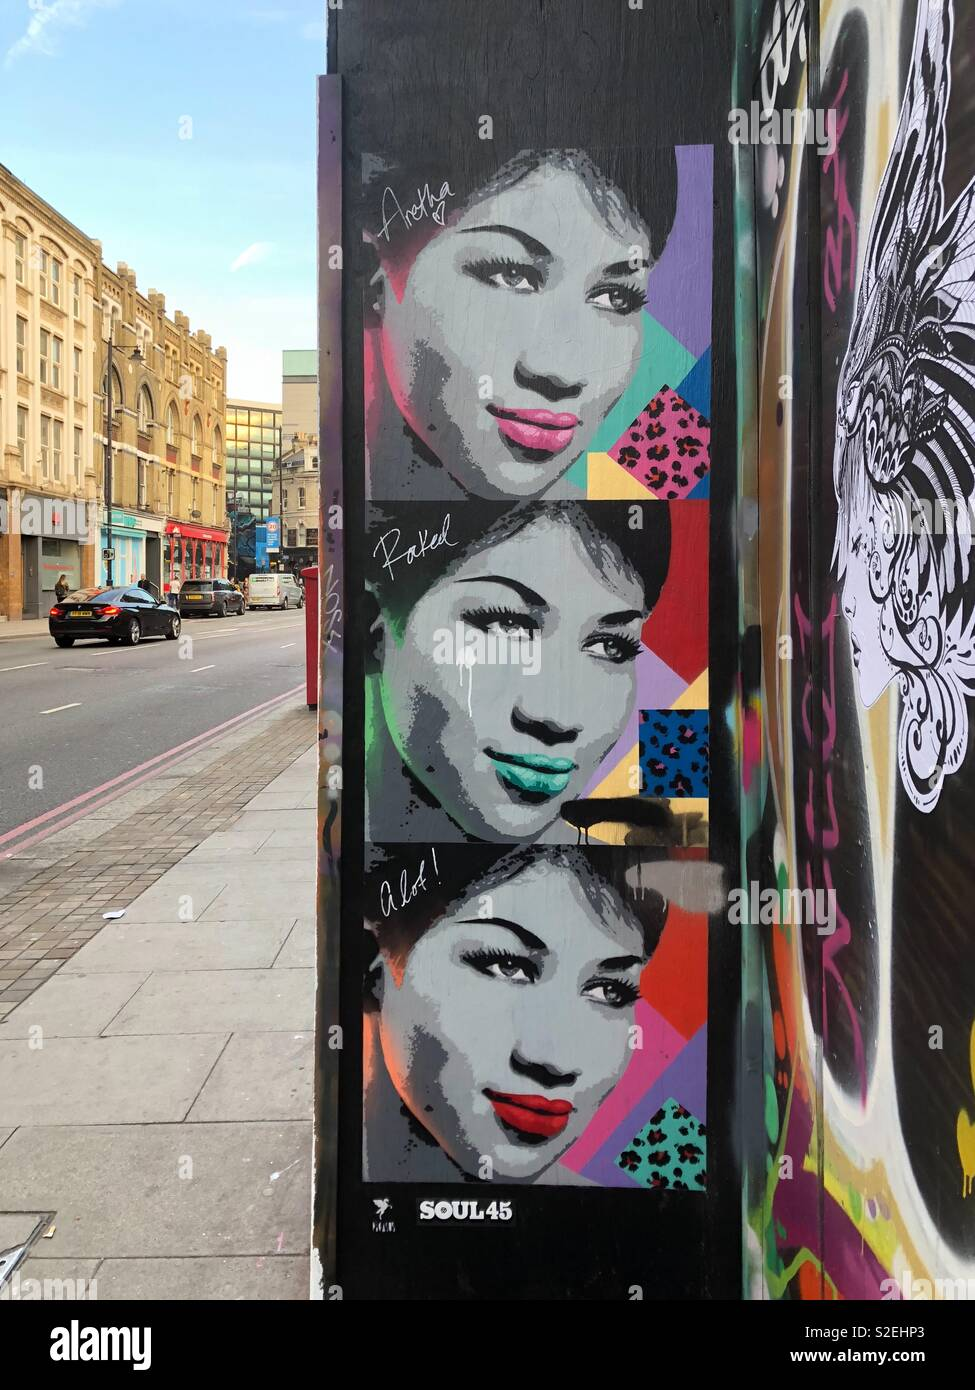 Icon Aretha Franklin pop art style graffiti in hoxton, London, england. Stock Photo